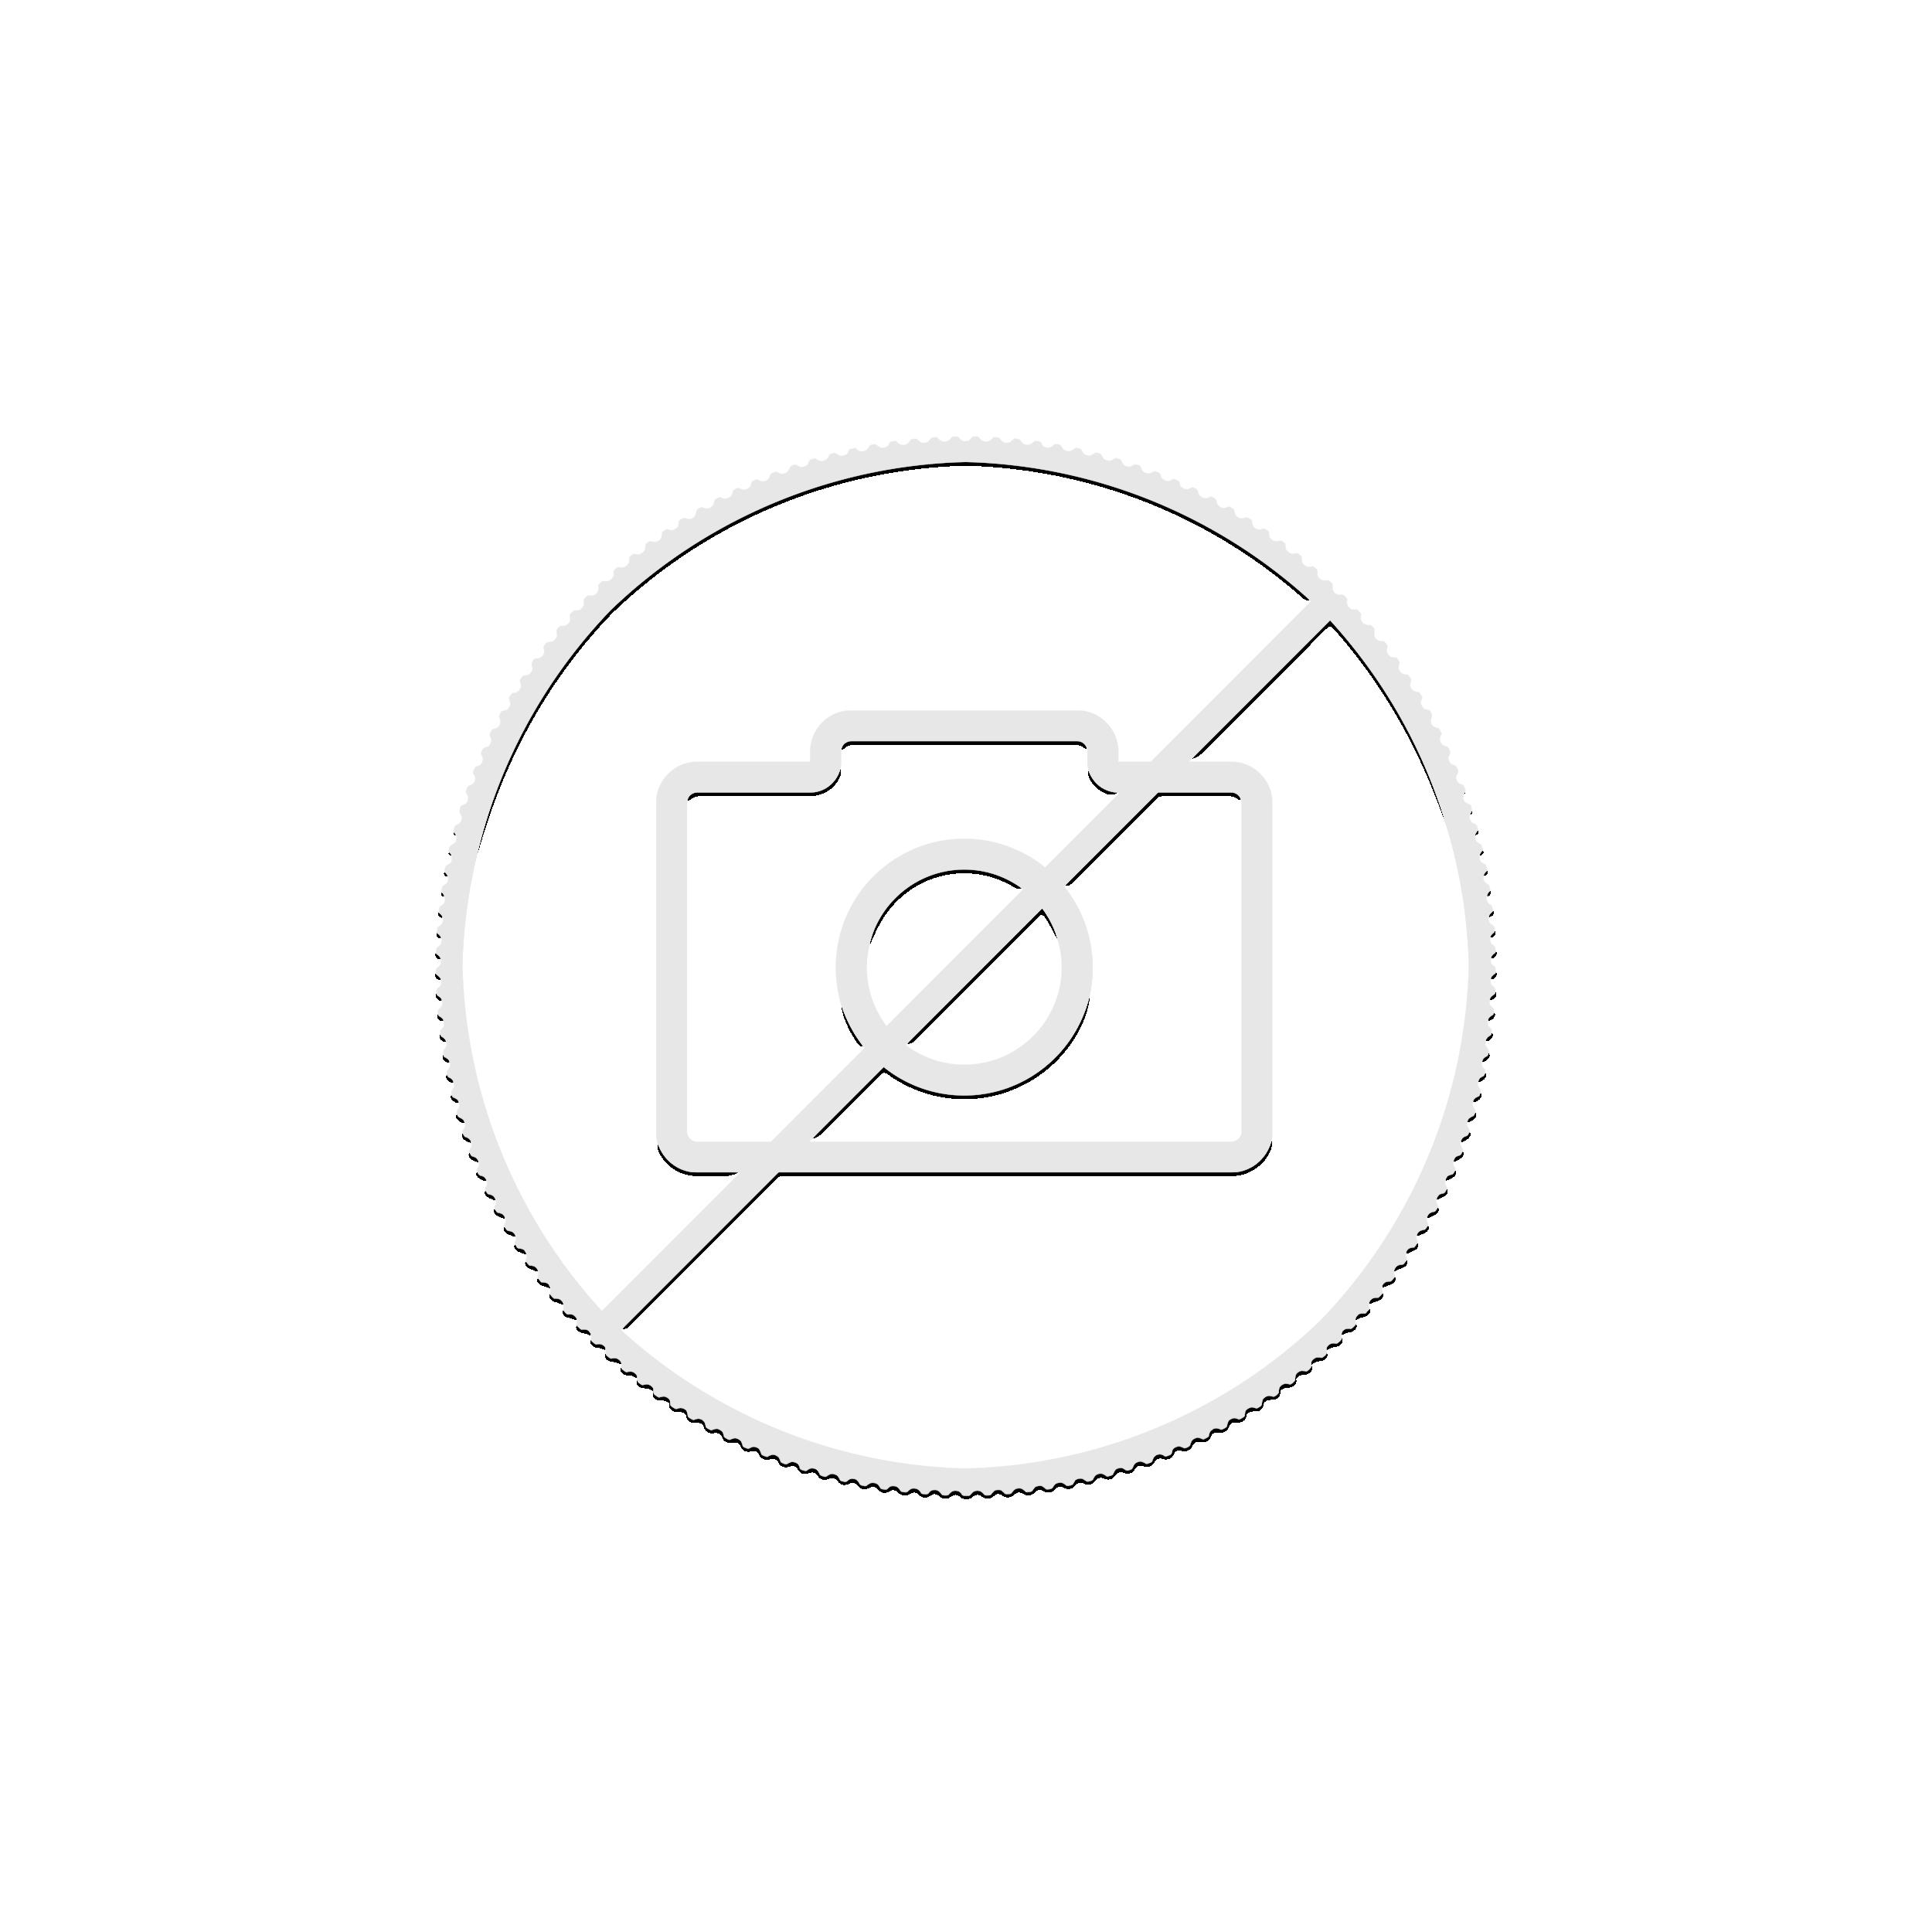 1/4 Troy ounce gold Krugerrand coin 2021 Paul Kruger